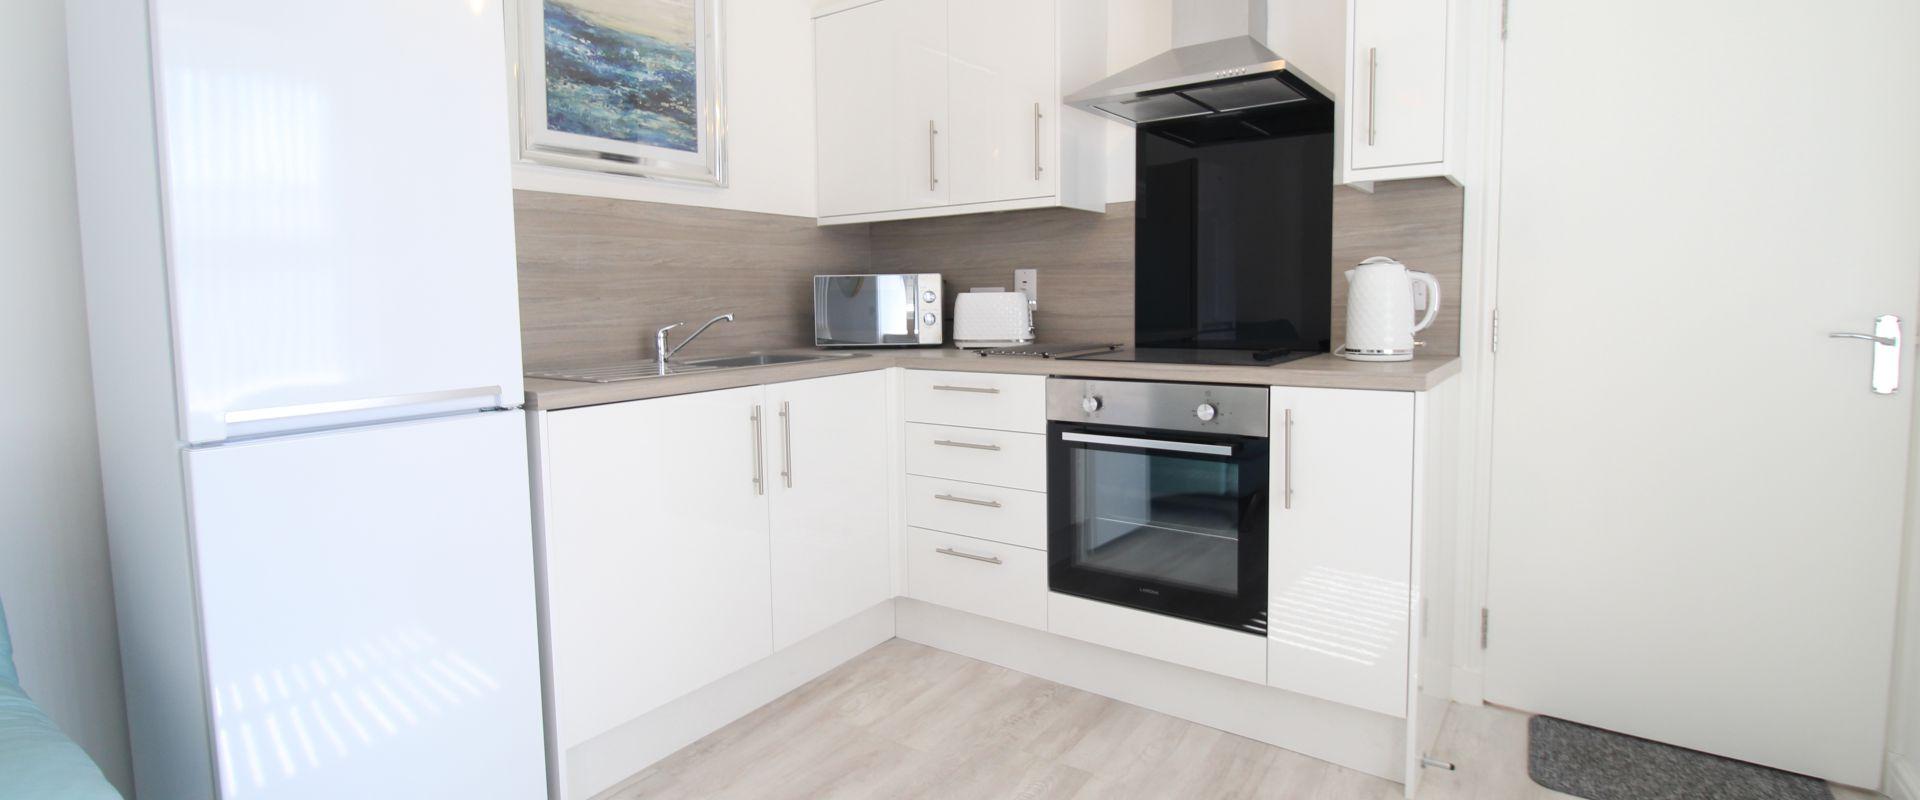 ARD-Properties-Development-Sites-Buy-Homes-Rent-Aberdeenshire-Rentals-Apartment-C-Loanhead-Terrace-Aberdeen-Banner (2)